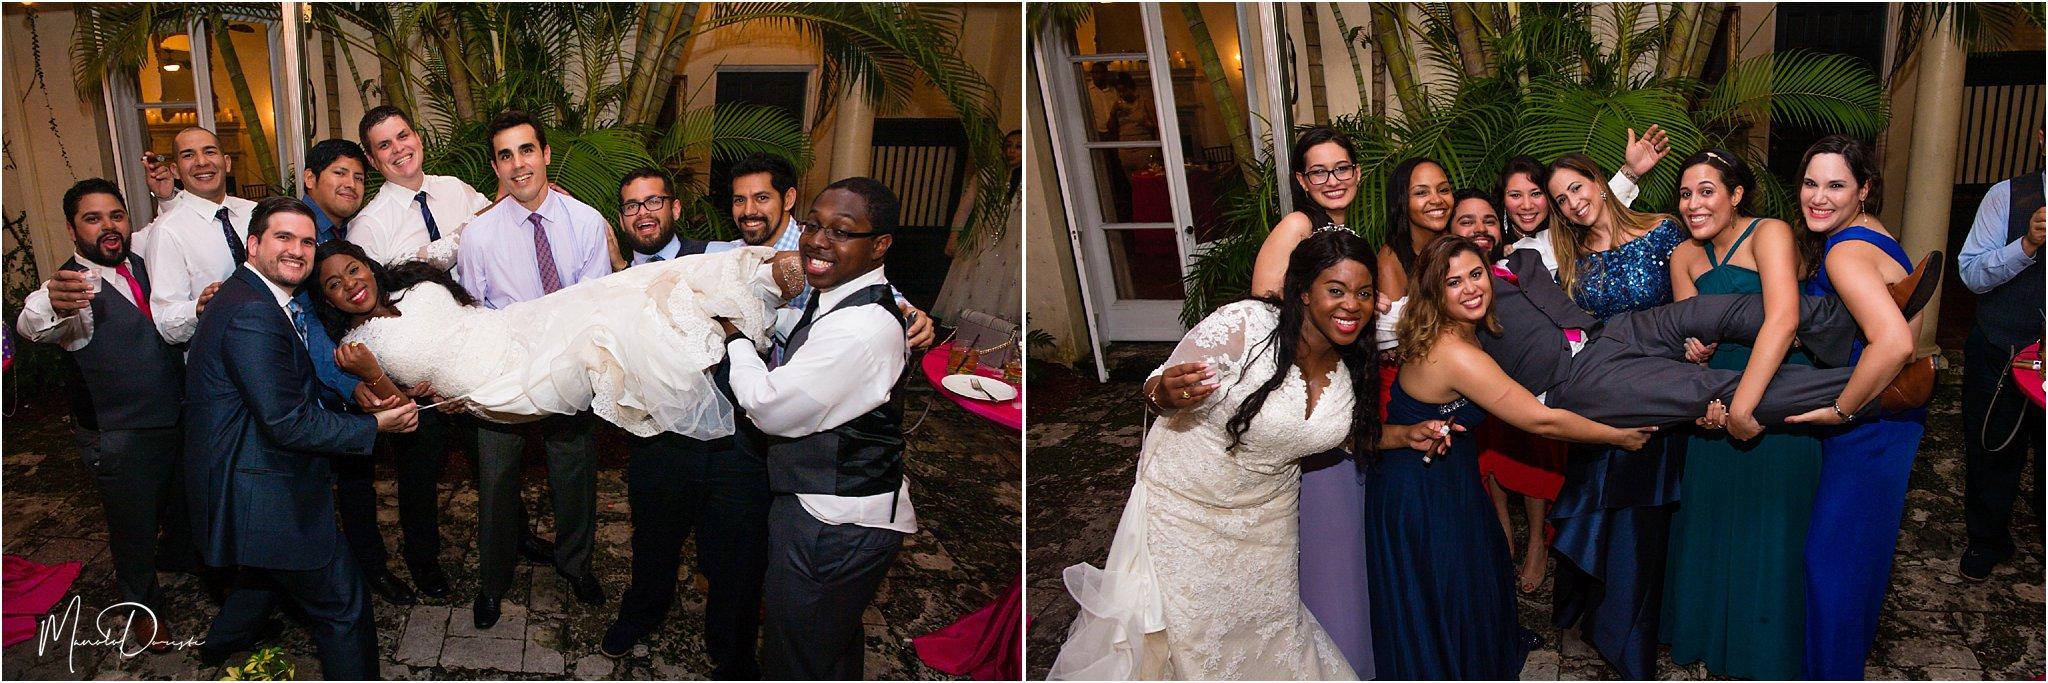 0434_ManoloDoreste_InFocusStudios_Wedding_Family_Photography_Miami_MiamiPhotographer.jpg